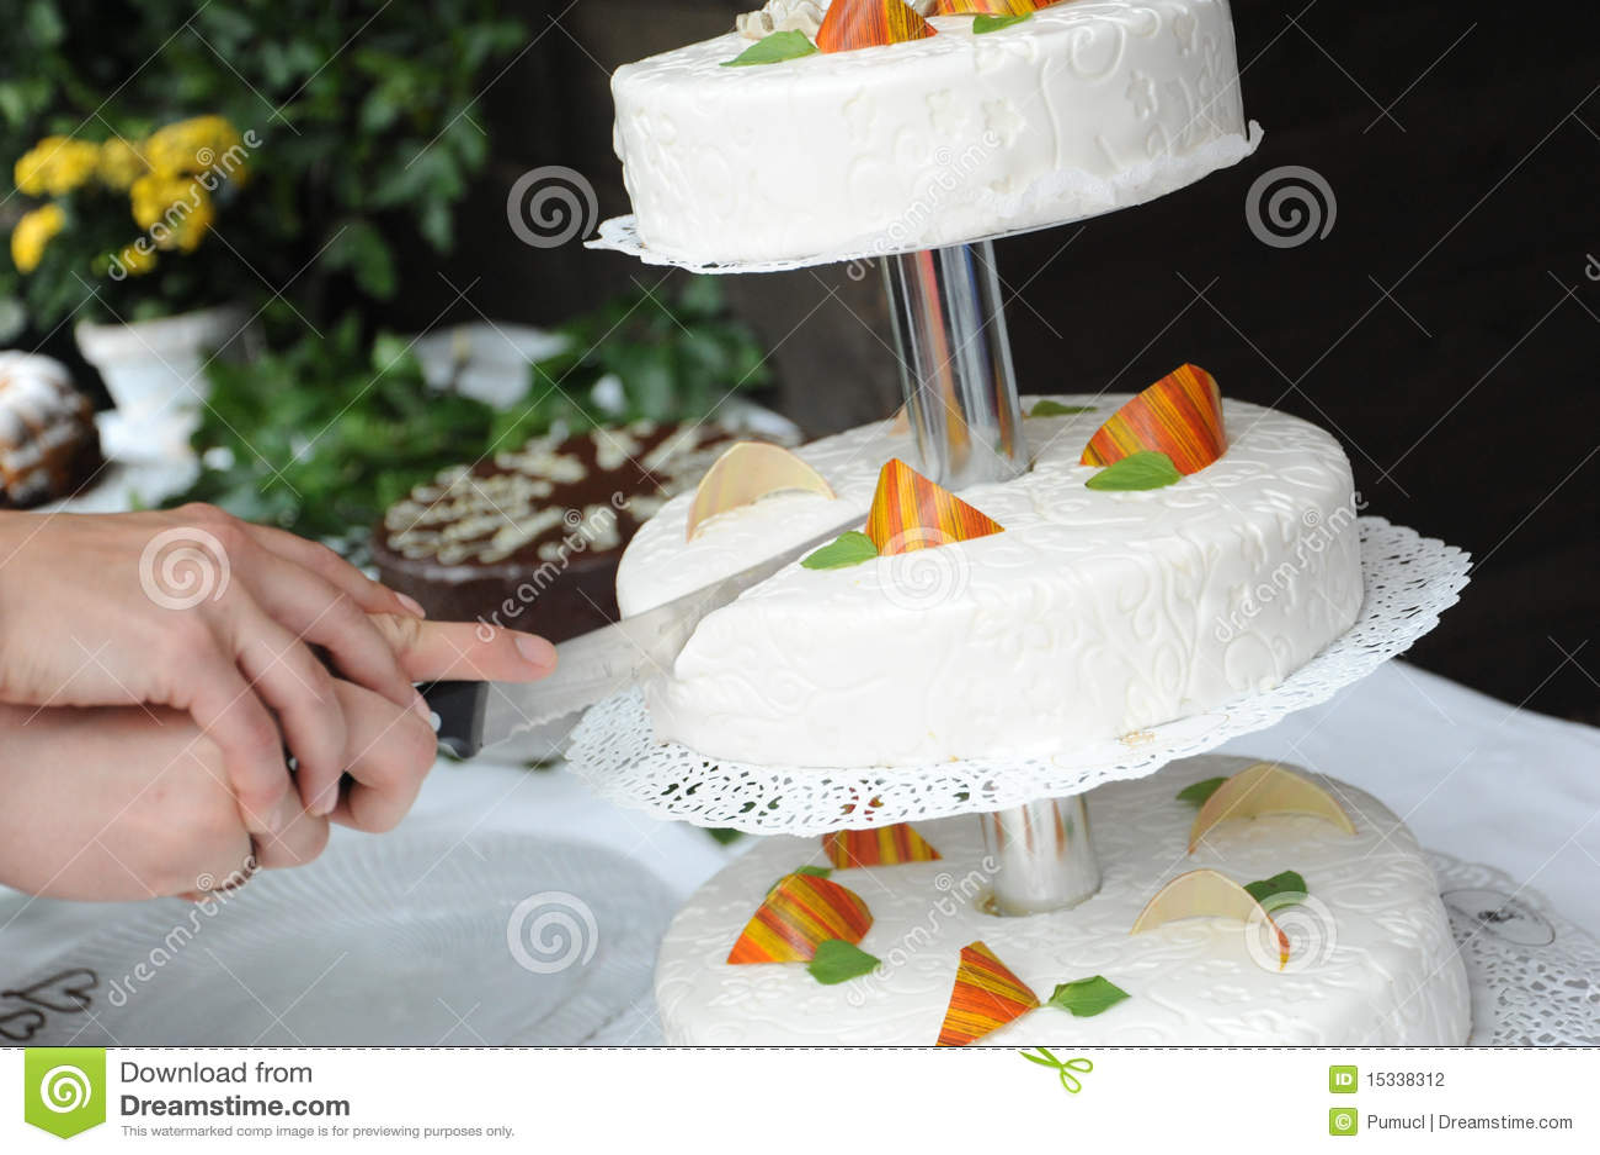 Cutting The Wedding Cake Stock Photography